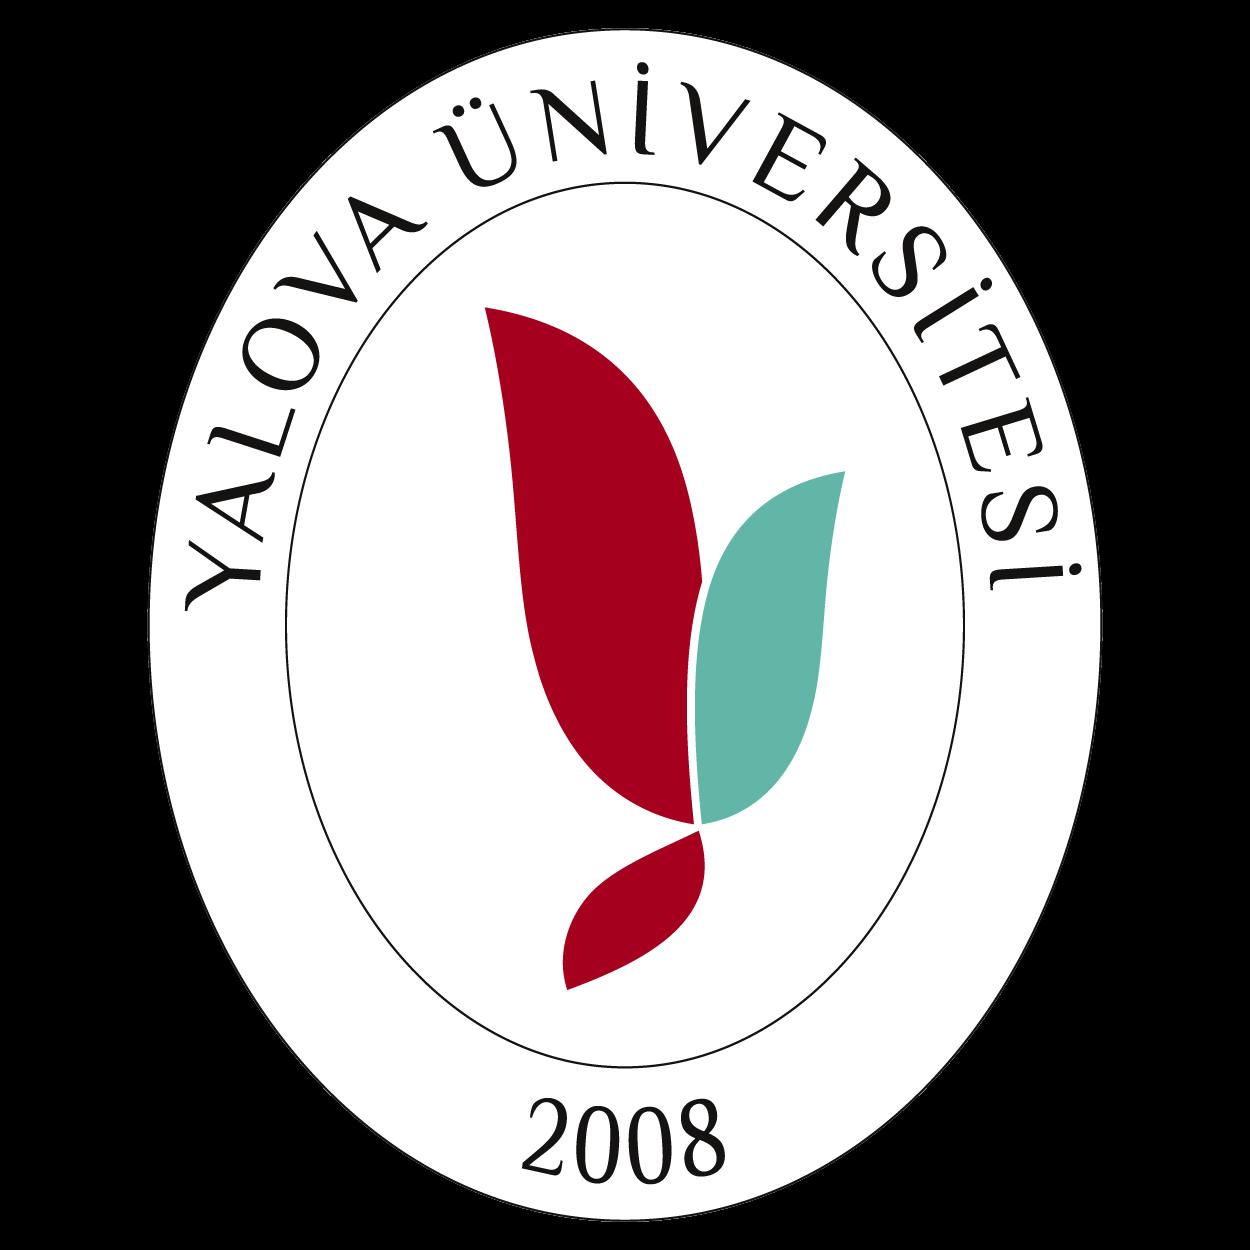 Yalova Üniversitesi Logo png